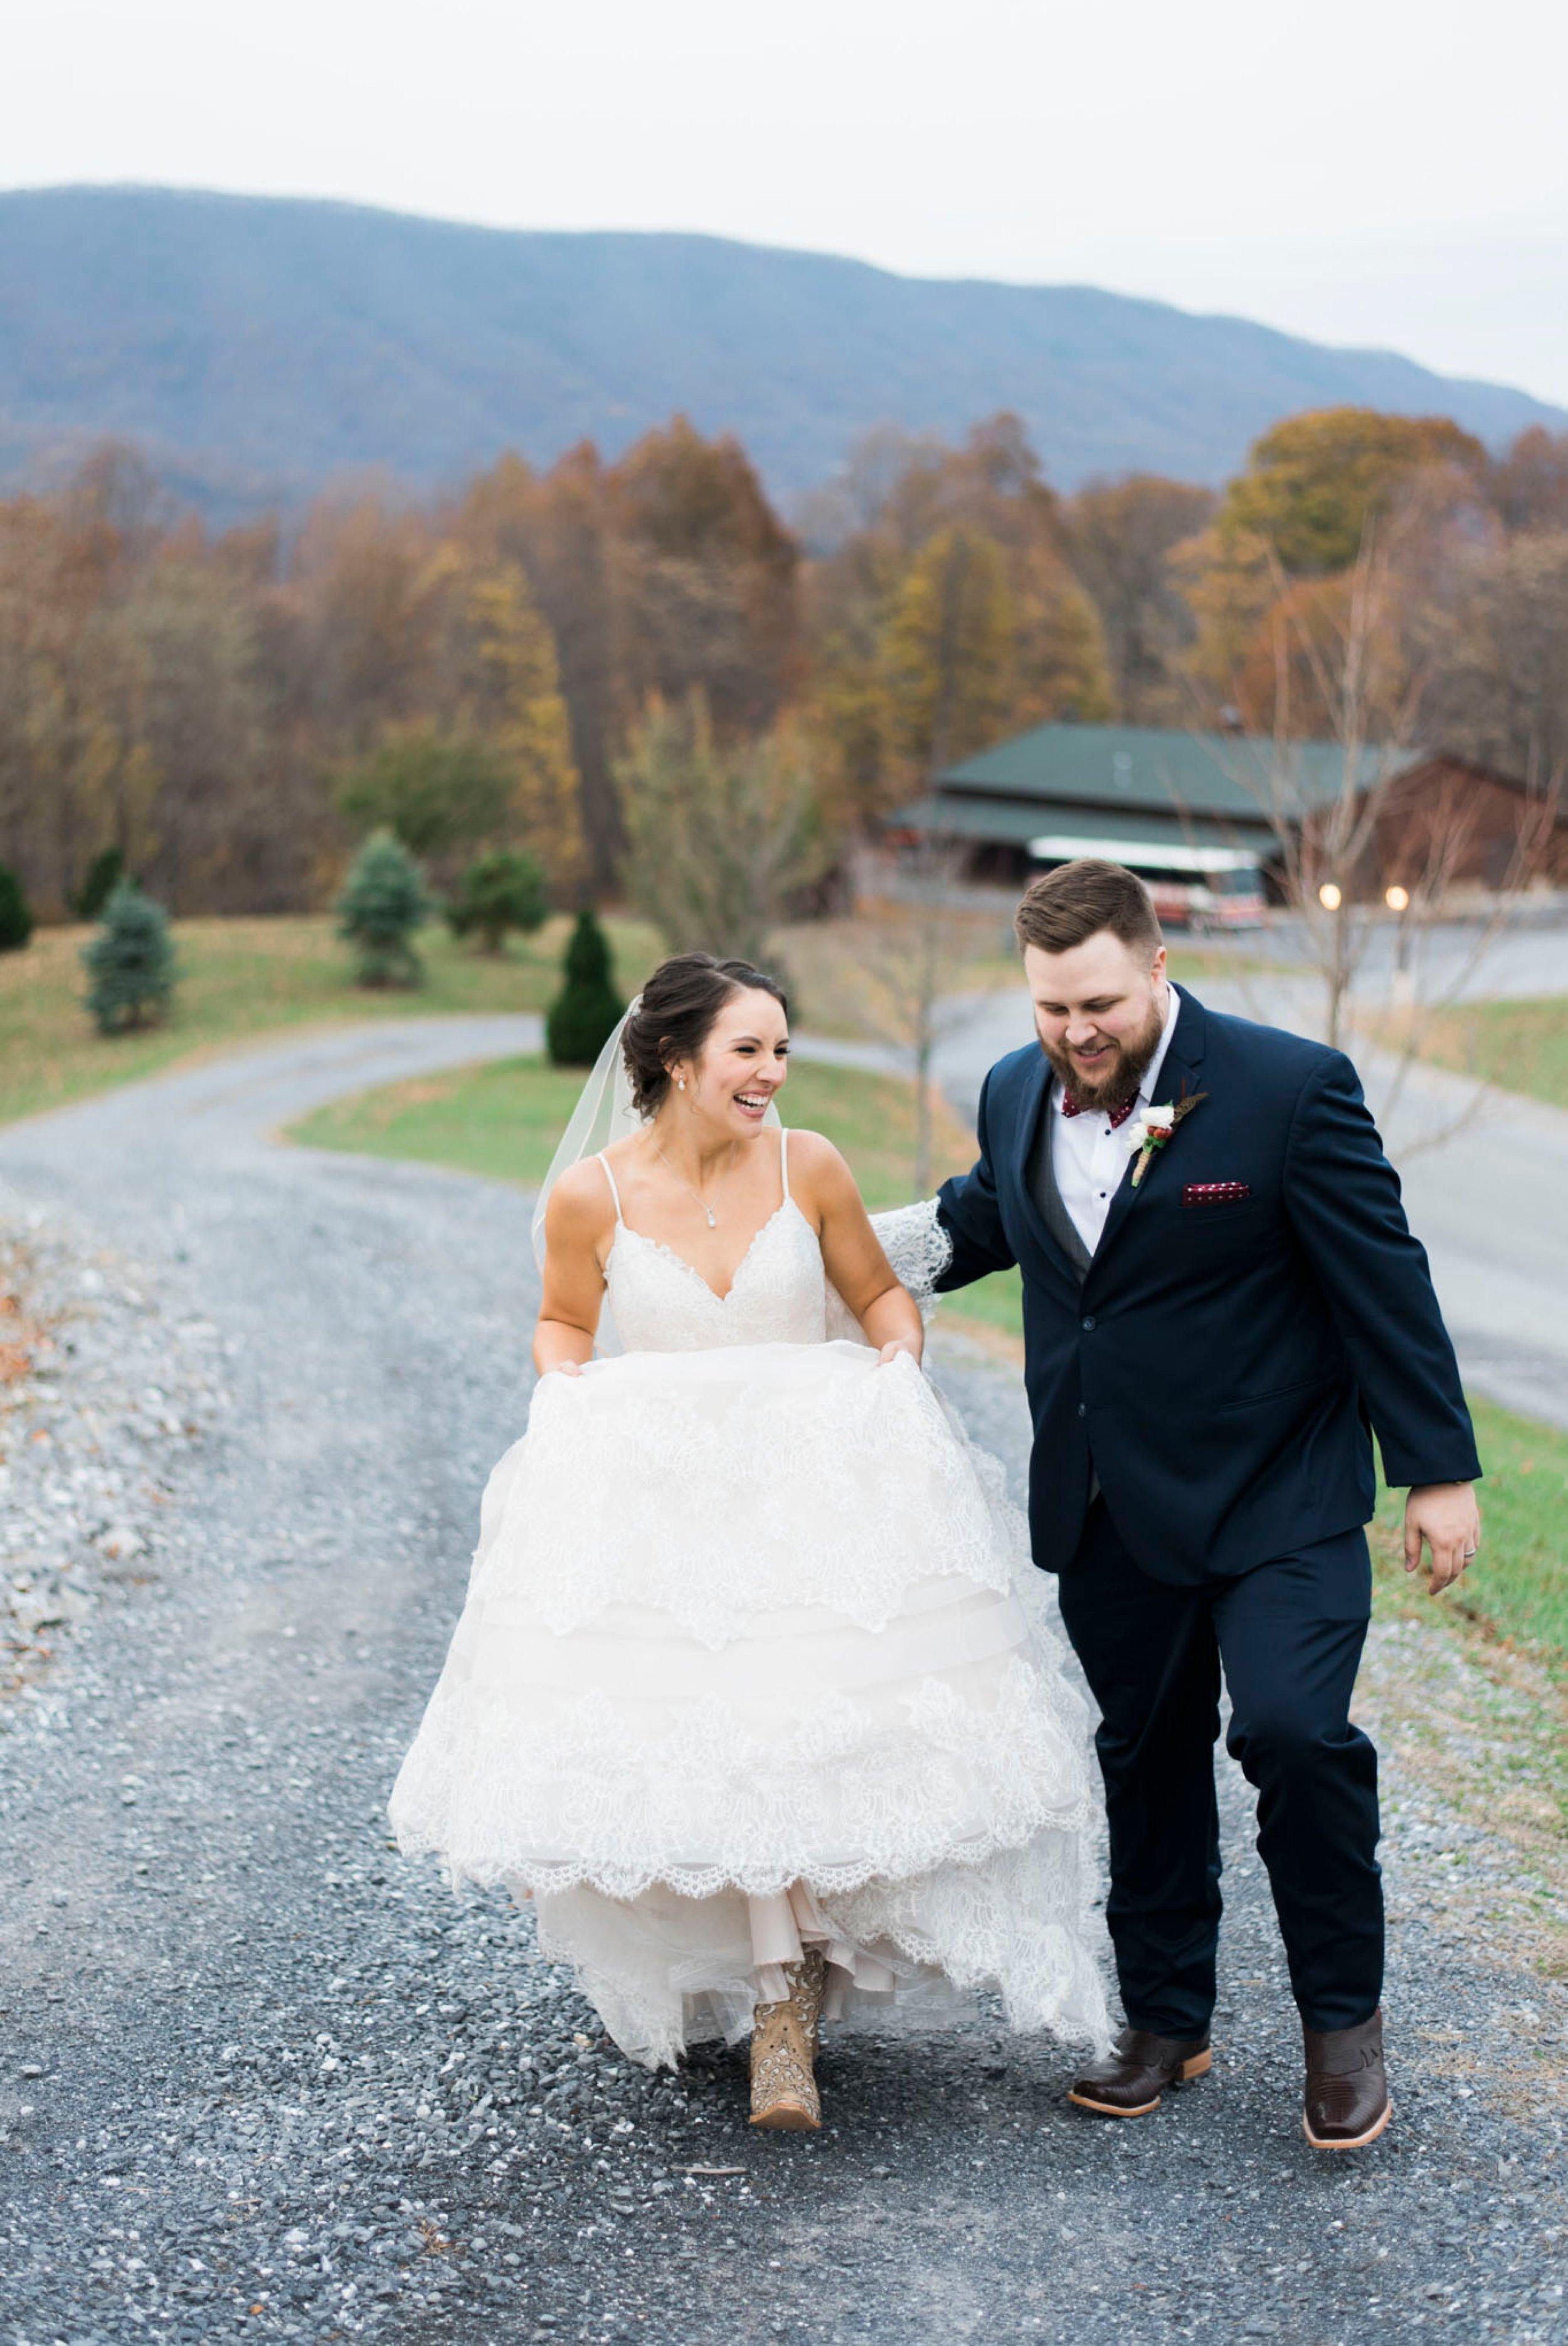 IrvineEstate_LexingtonVA_Wedding_FallWedding_VirginiaWeddingPhotographer 92.jpg